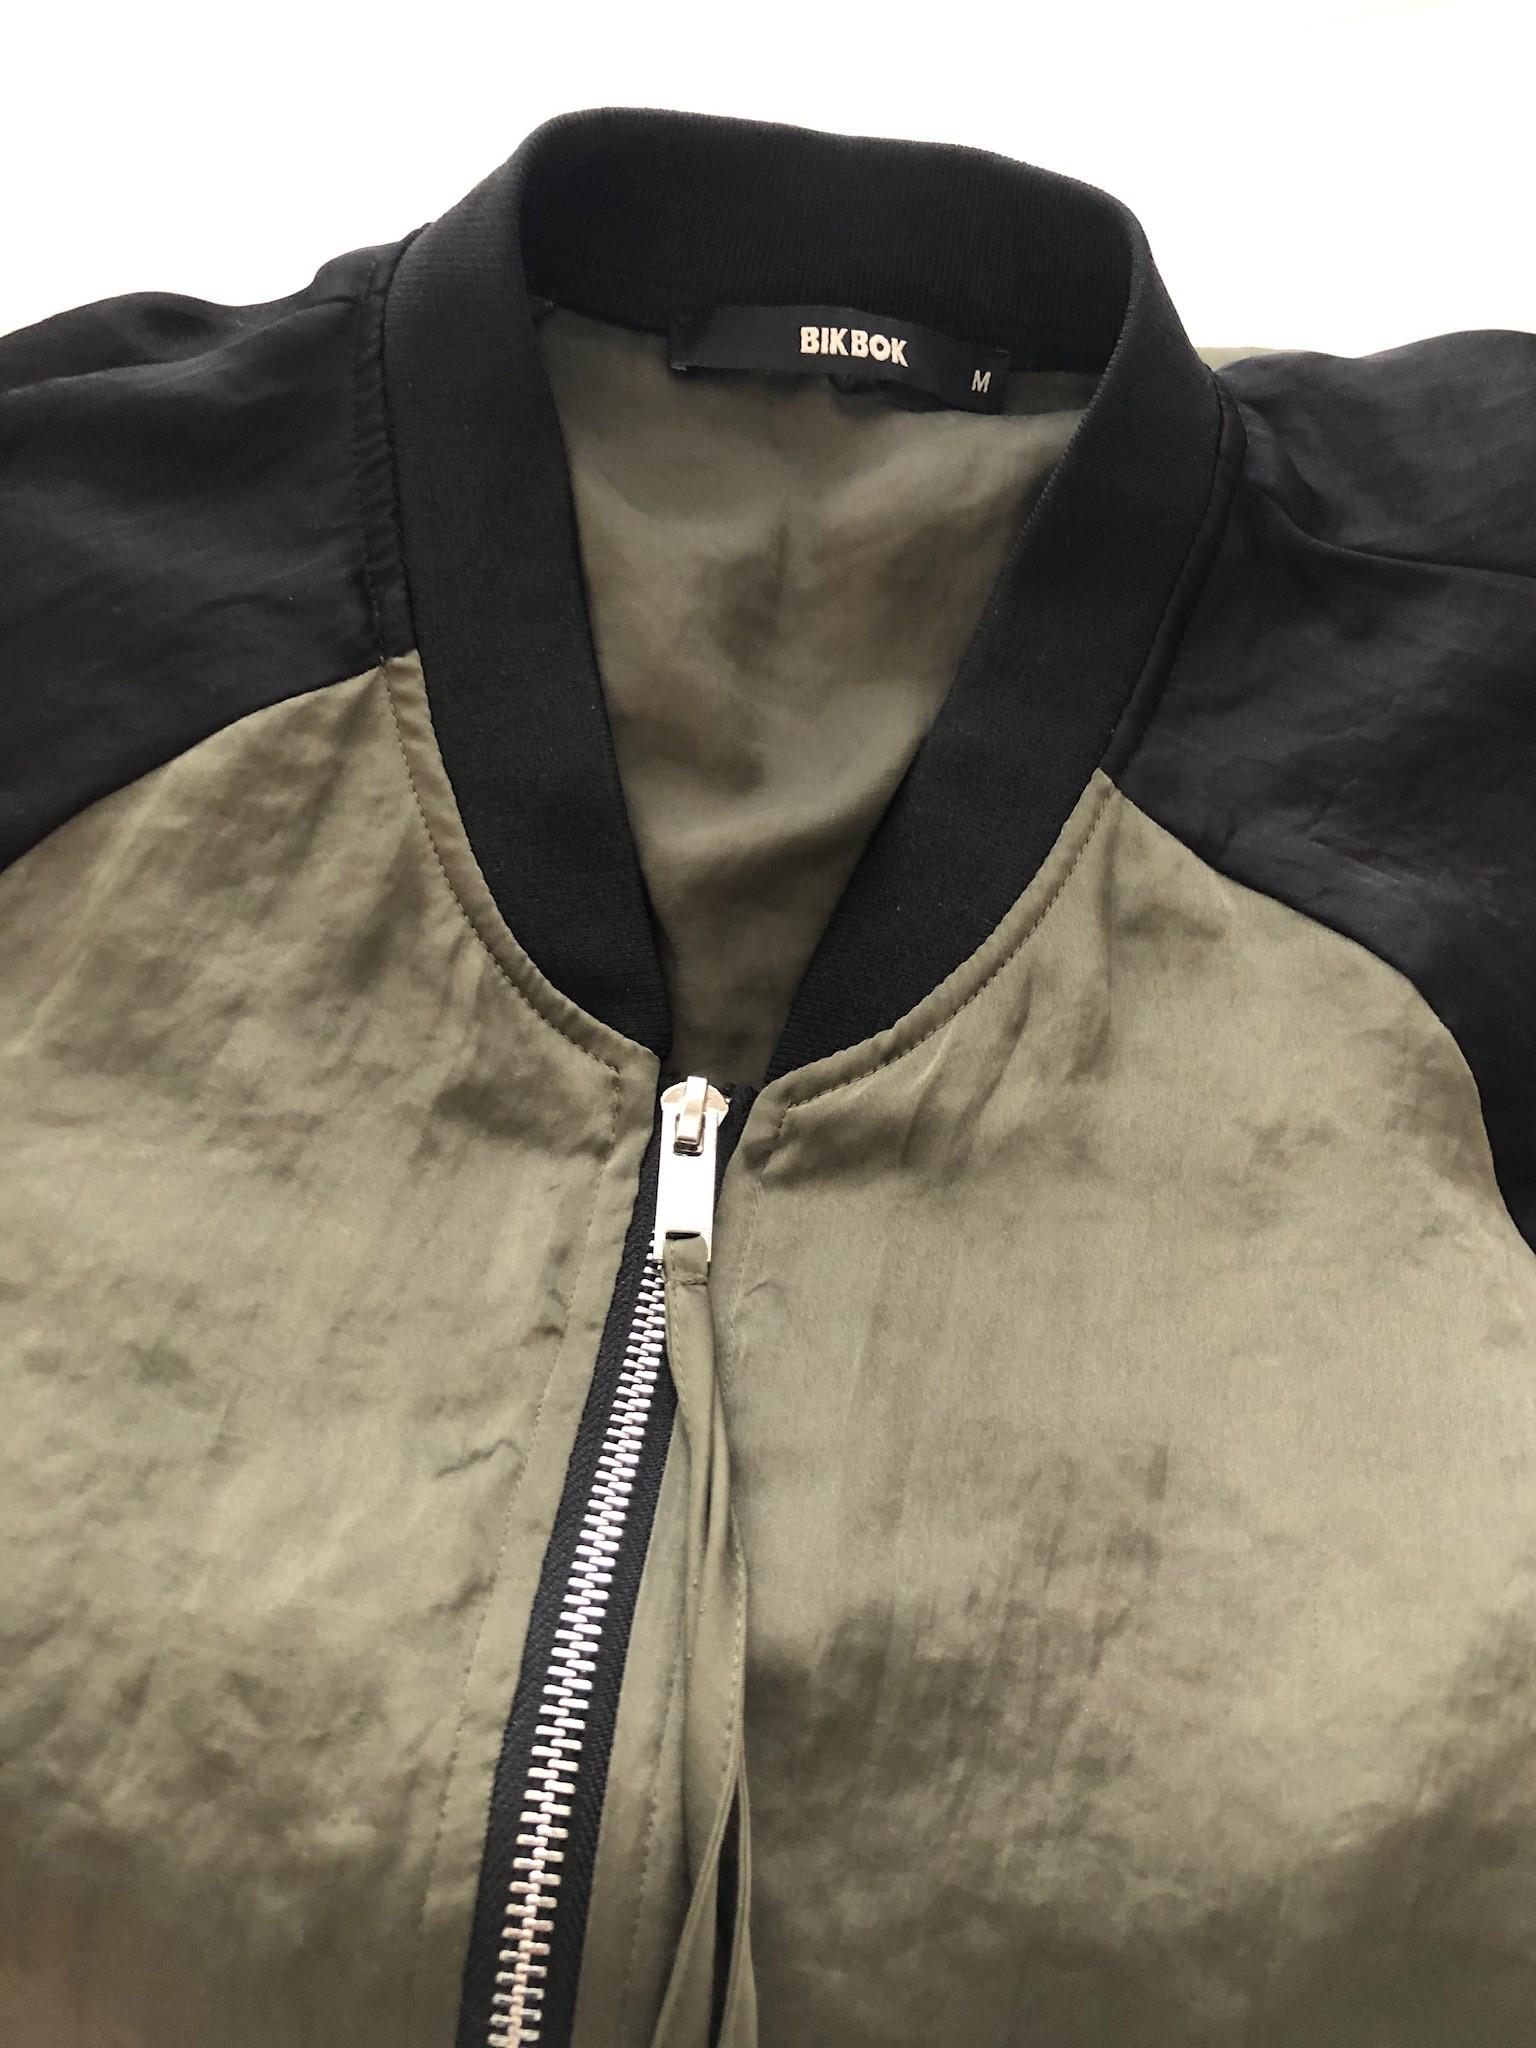 Bik Bok Bomber Jacket | FINN.no